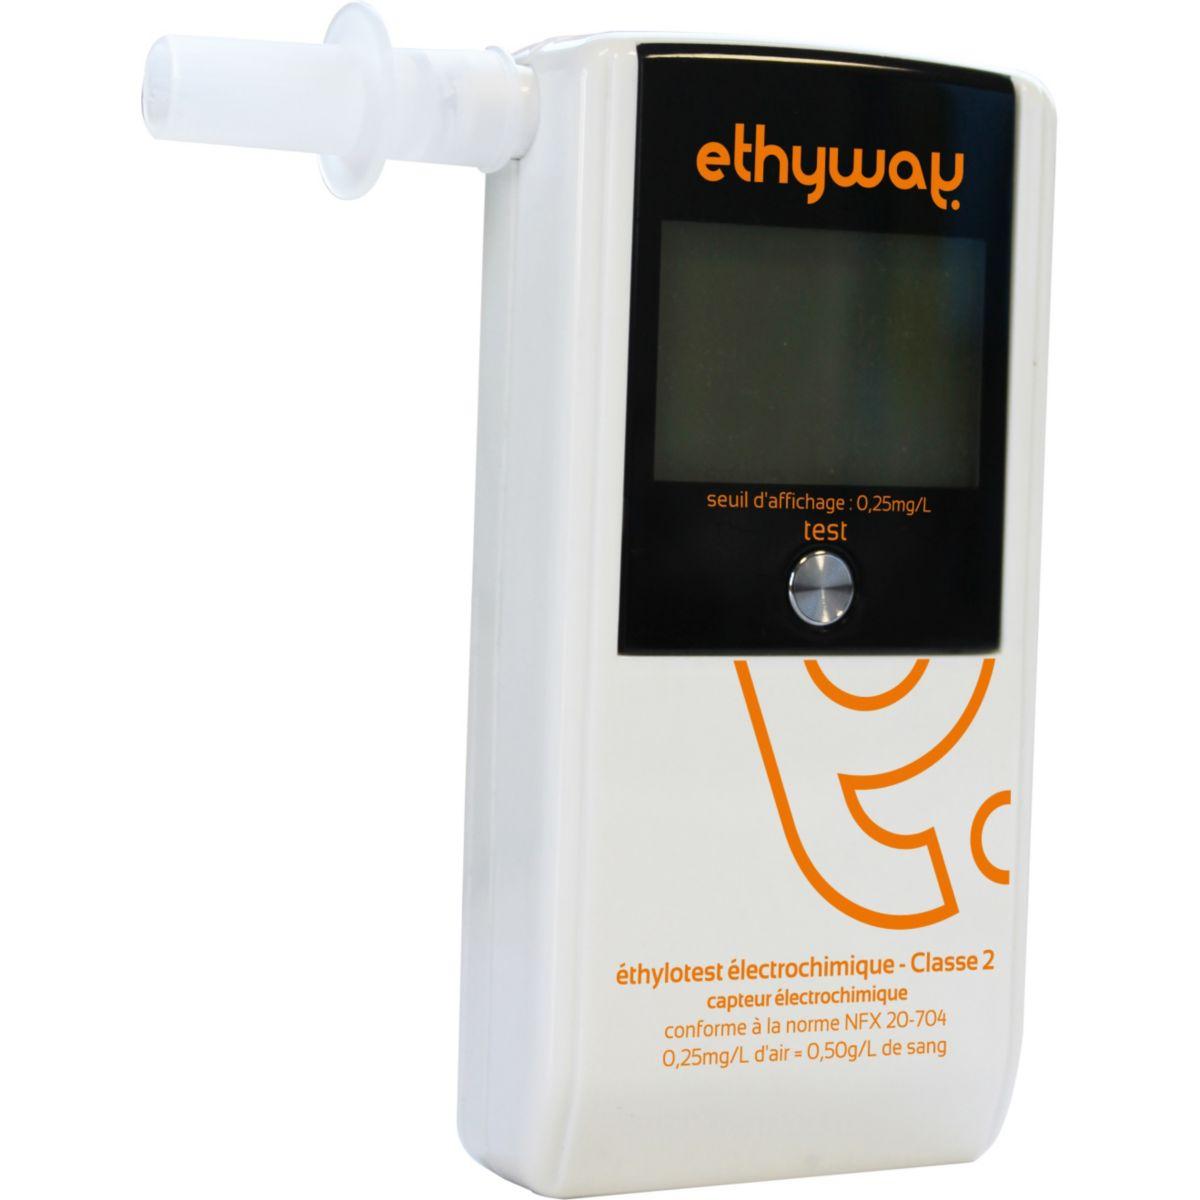 Ethylotest ETHYLEC Ethyway Electronique (photo)